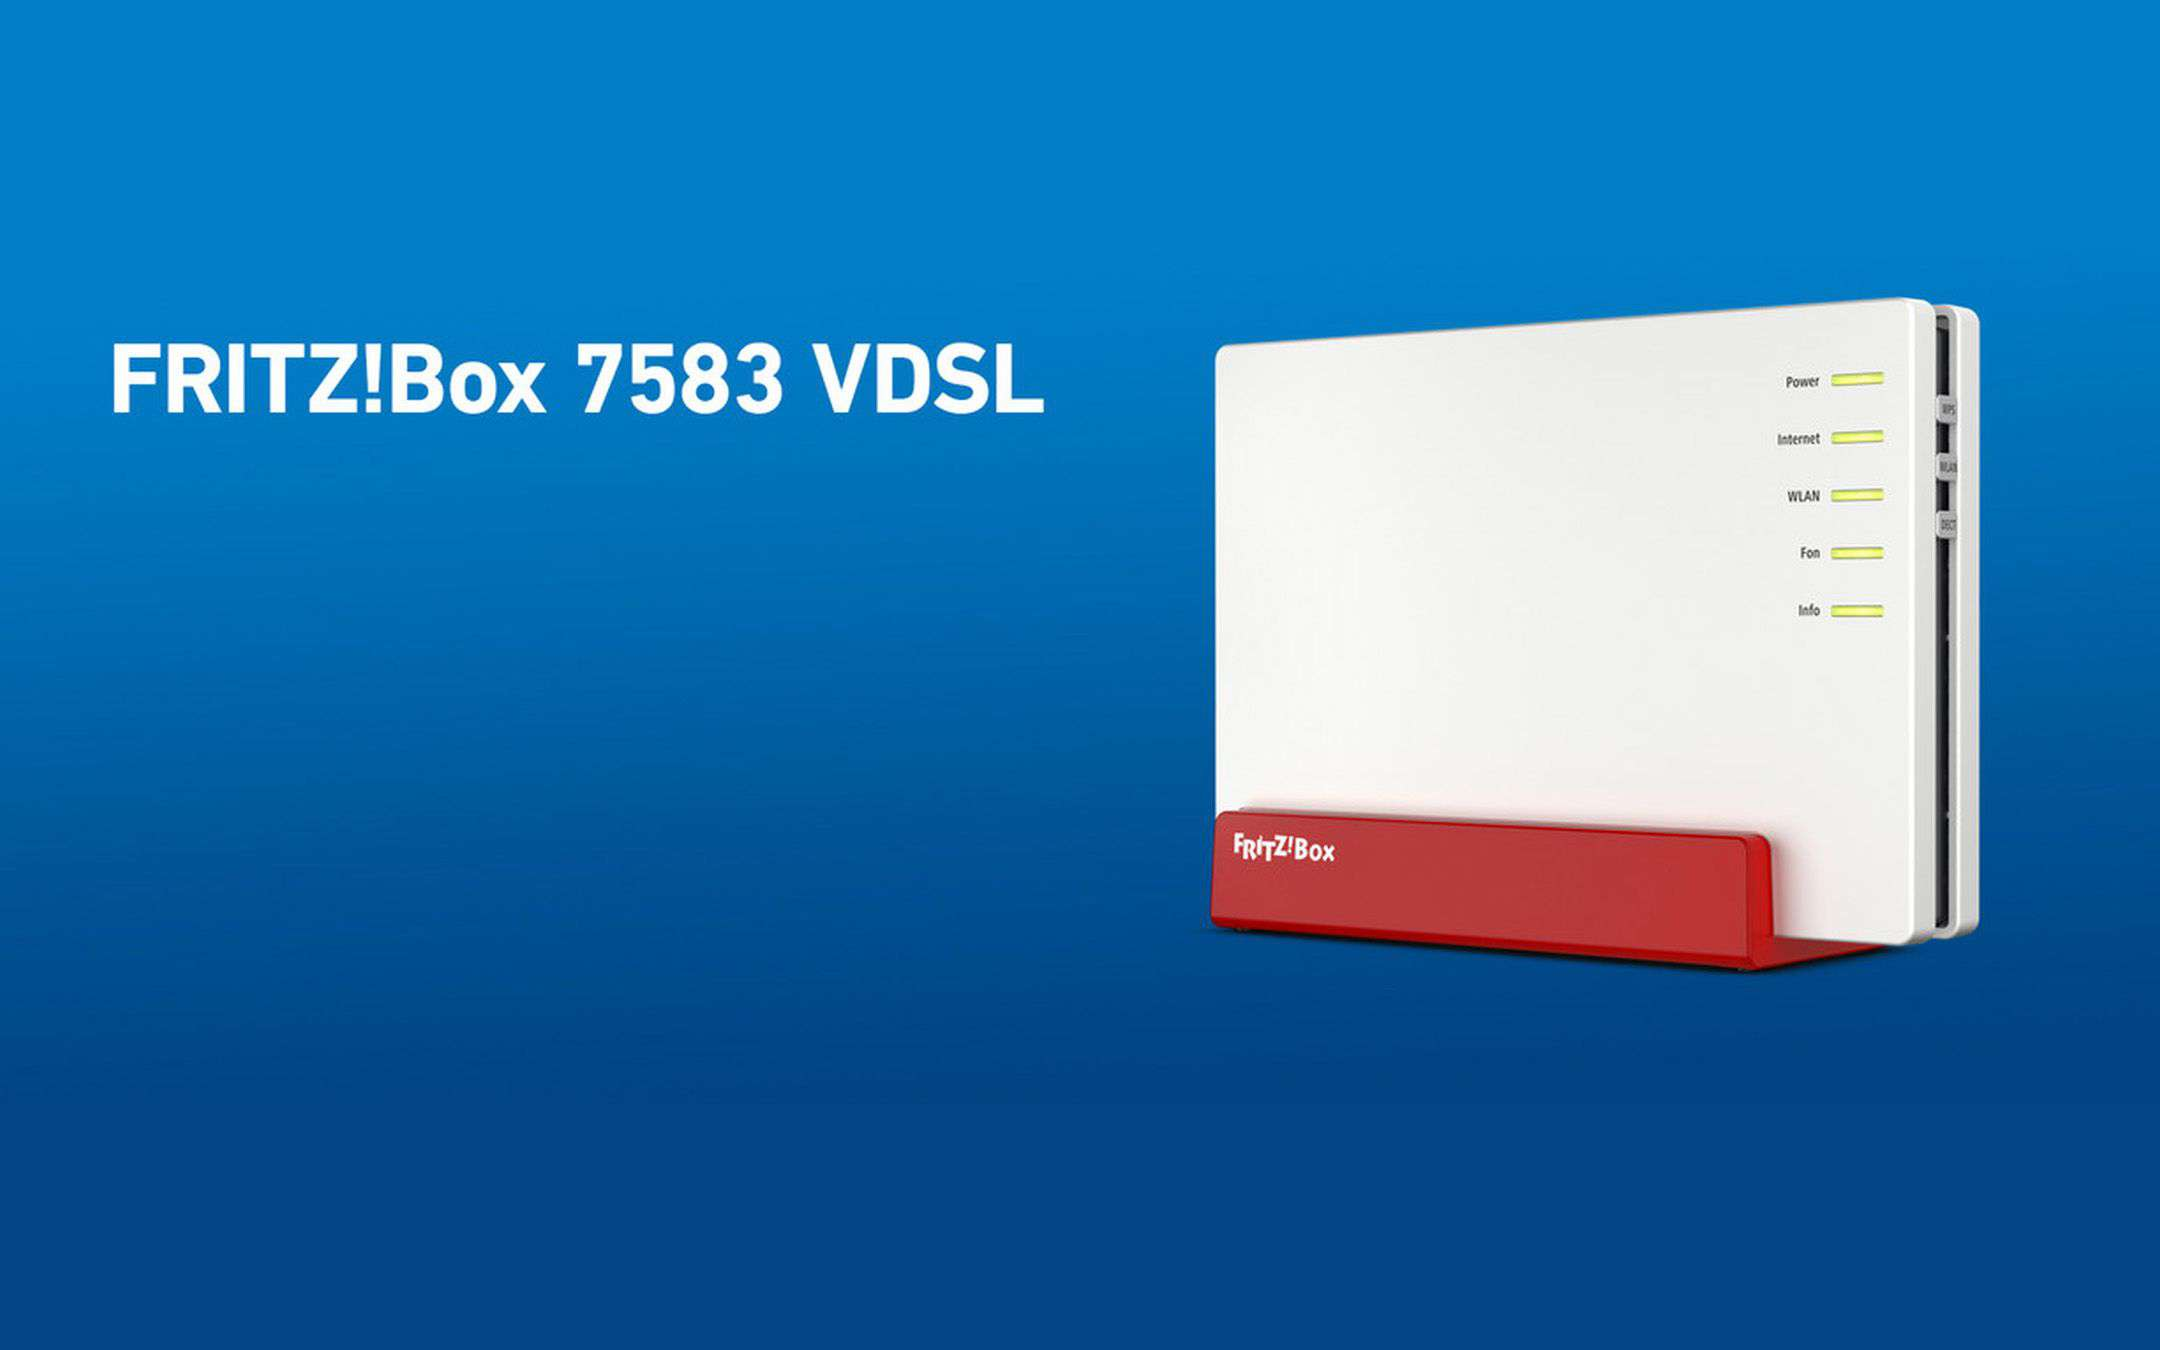 AVM FRITZ! Box 7583, new high-end router